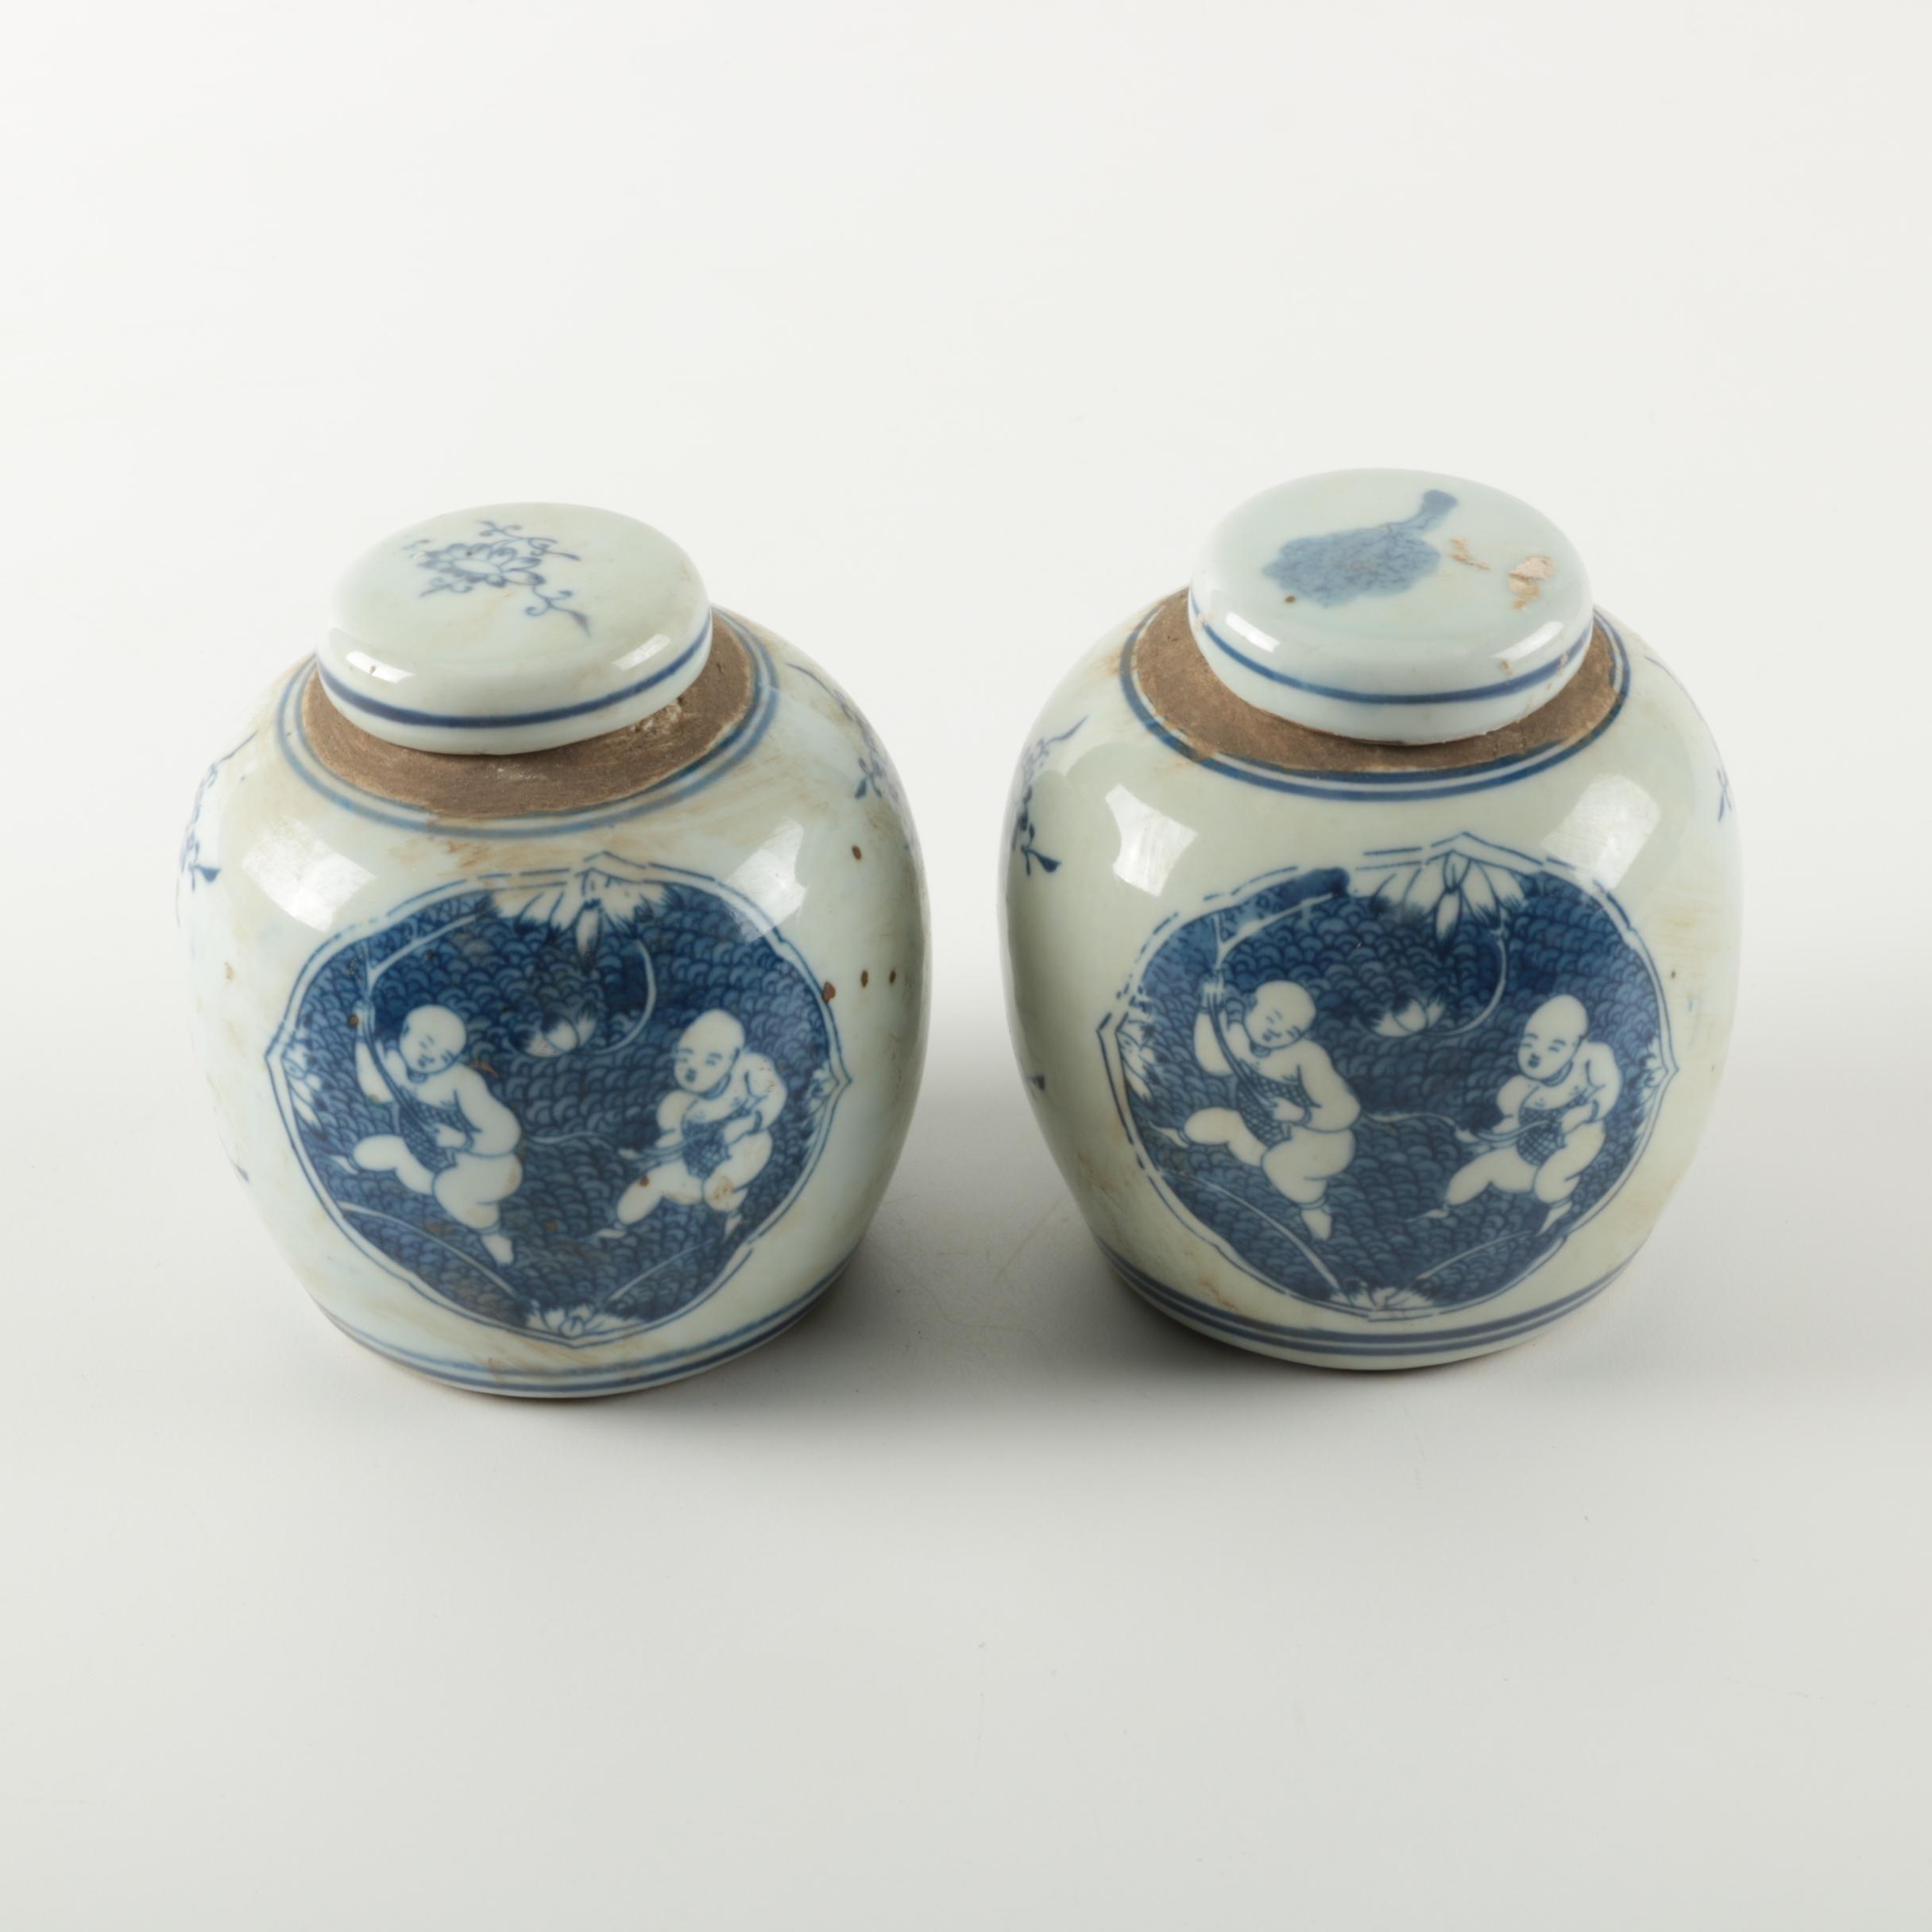 Chinese Ginger Jars